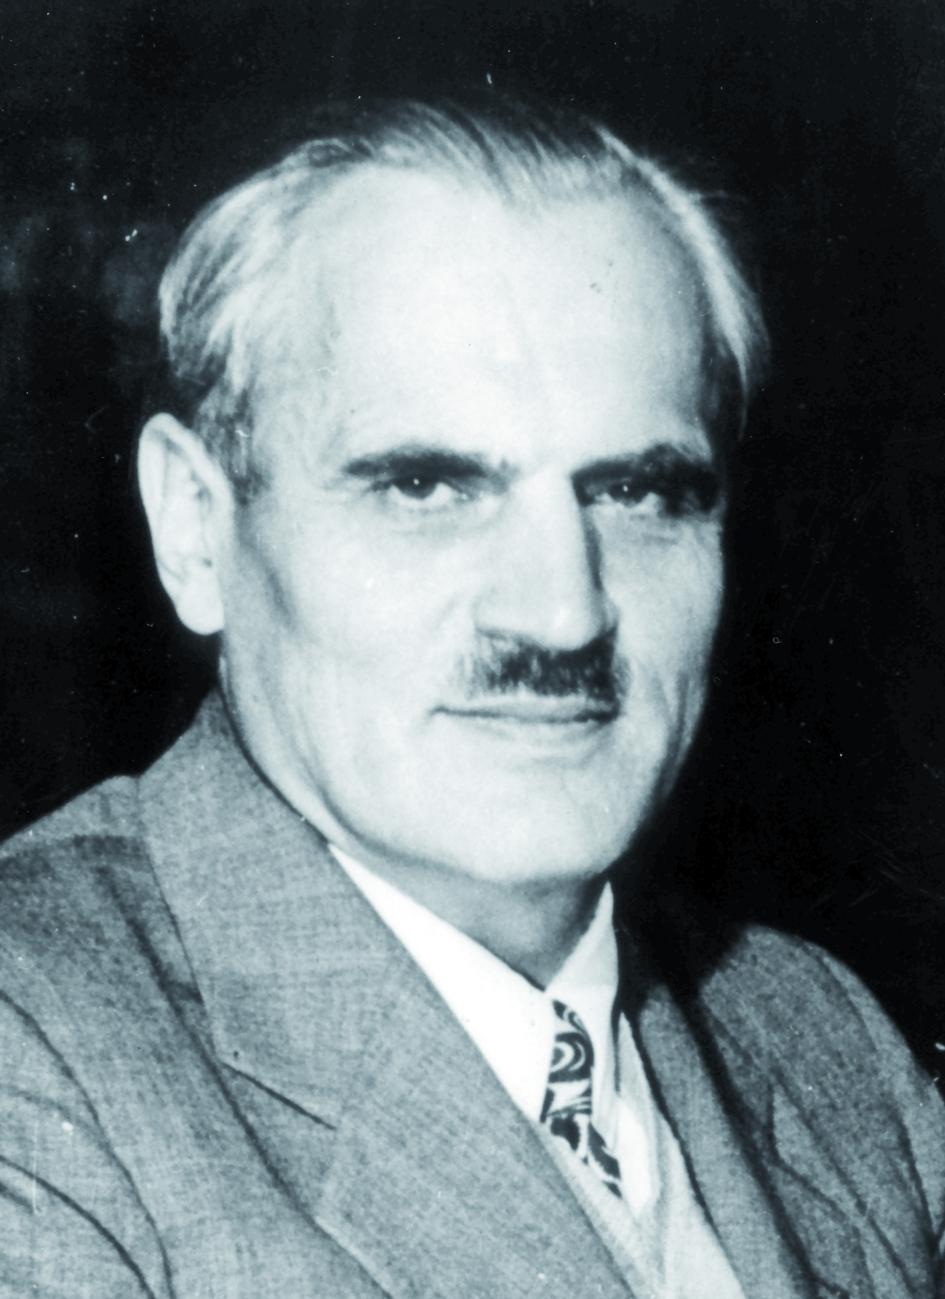 Portraitfoto von Herrn Sir Arthur Holly Compton.